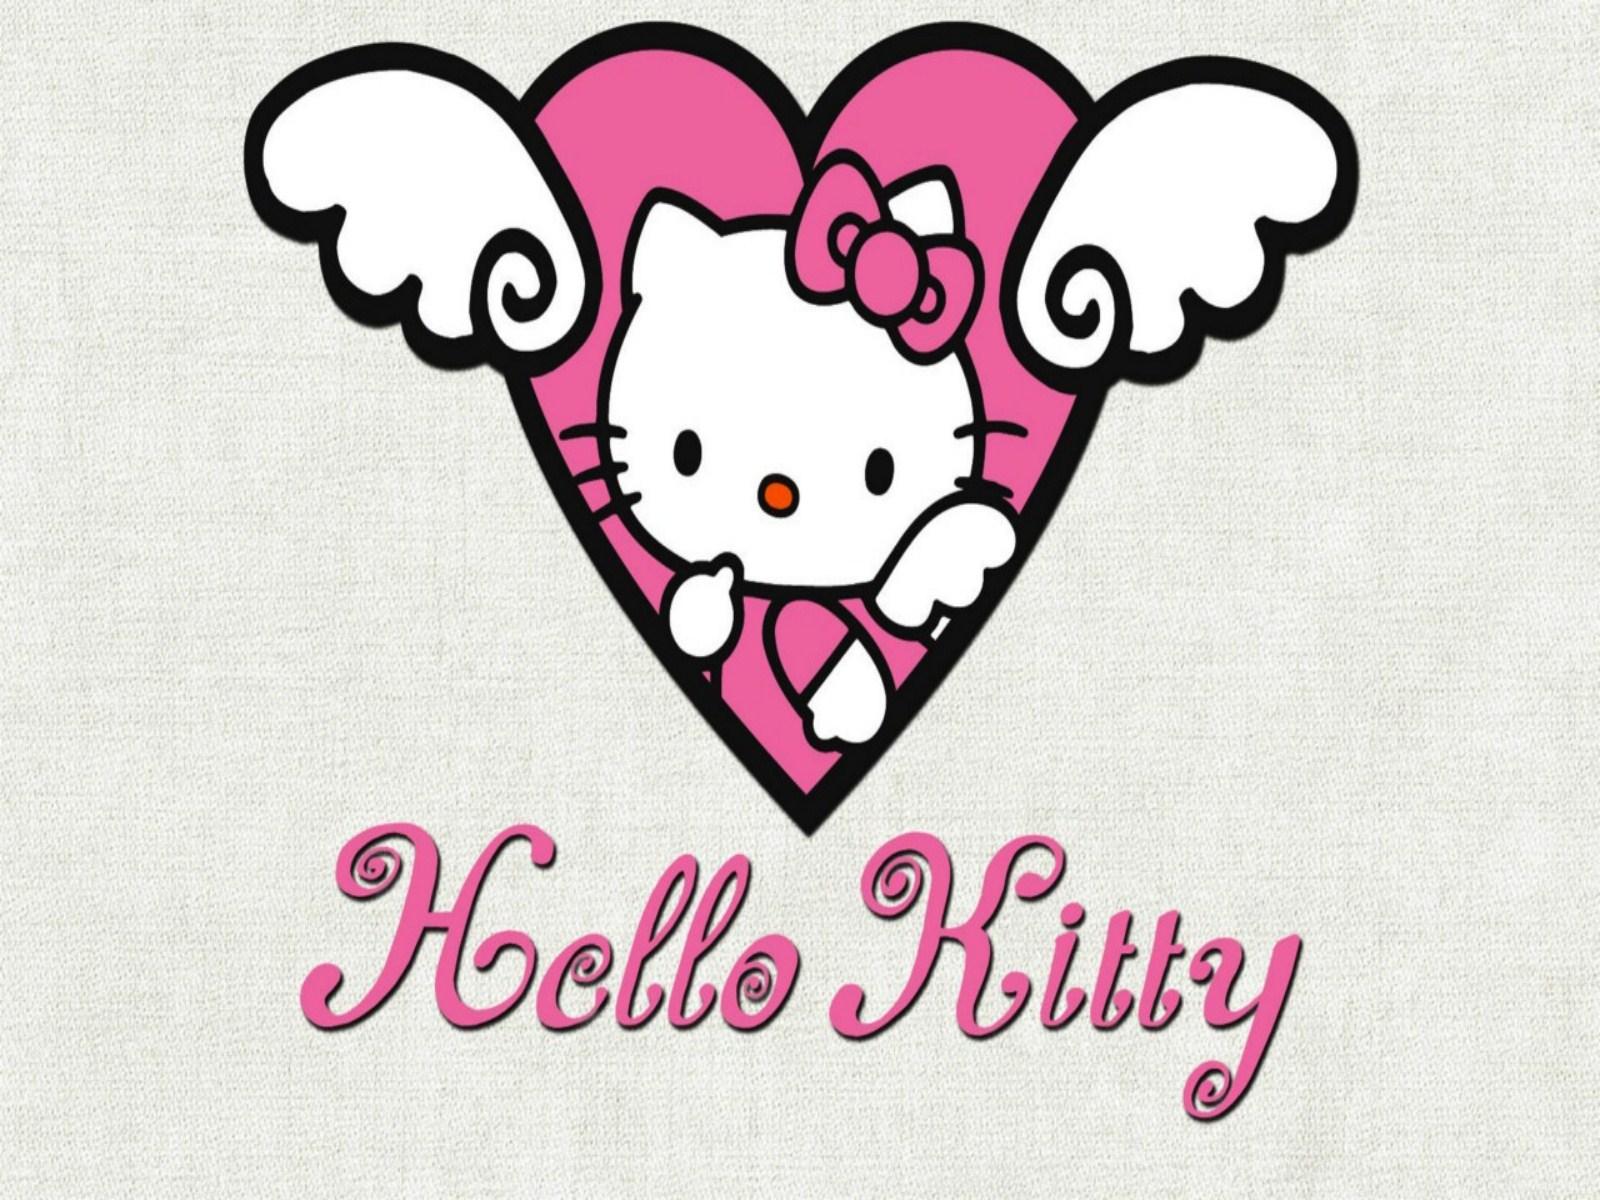 Hd Hello Kitty 1600x1200